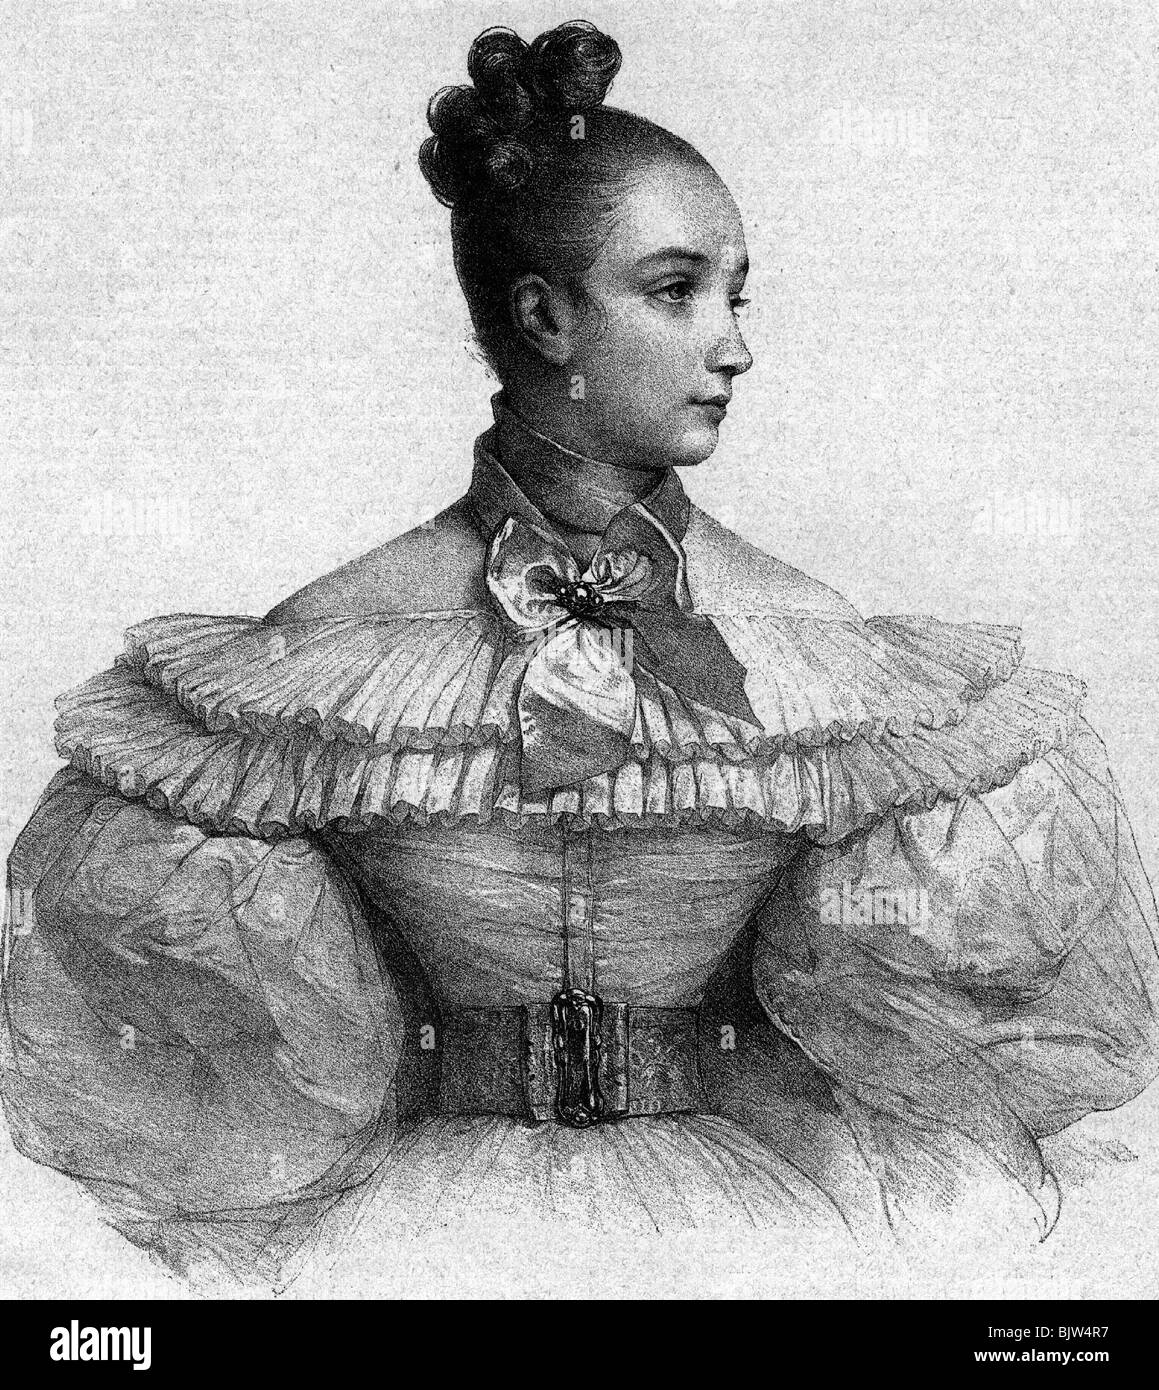 fashion, ladie's fashion, 19th century, dress with puffy sleeve, wood engraving, illustration 'Frederike' - Stock Image